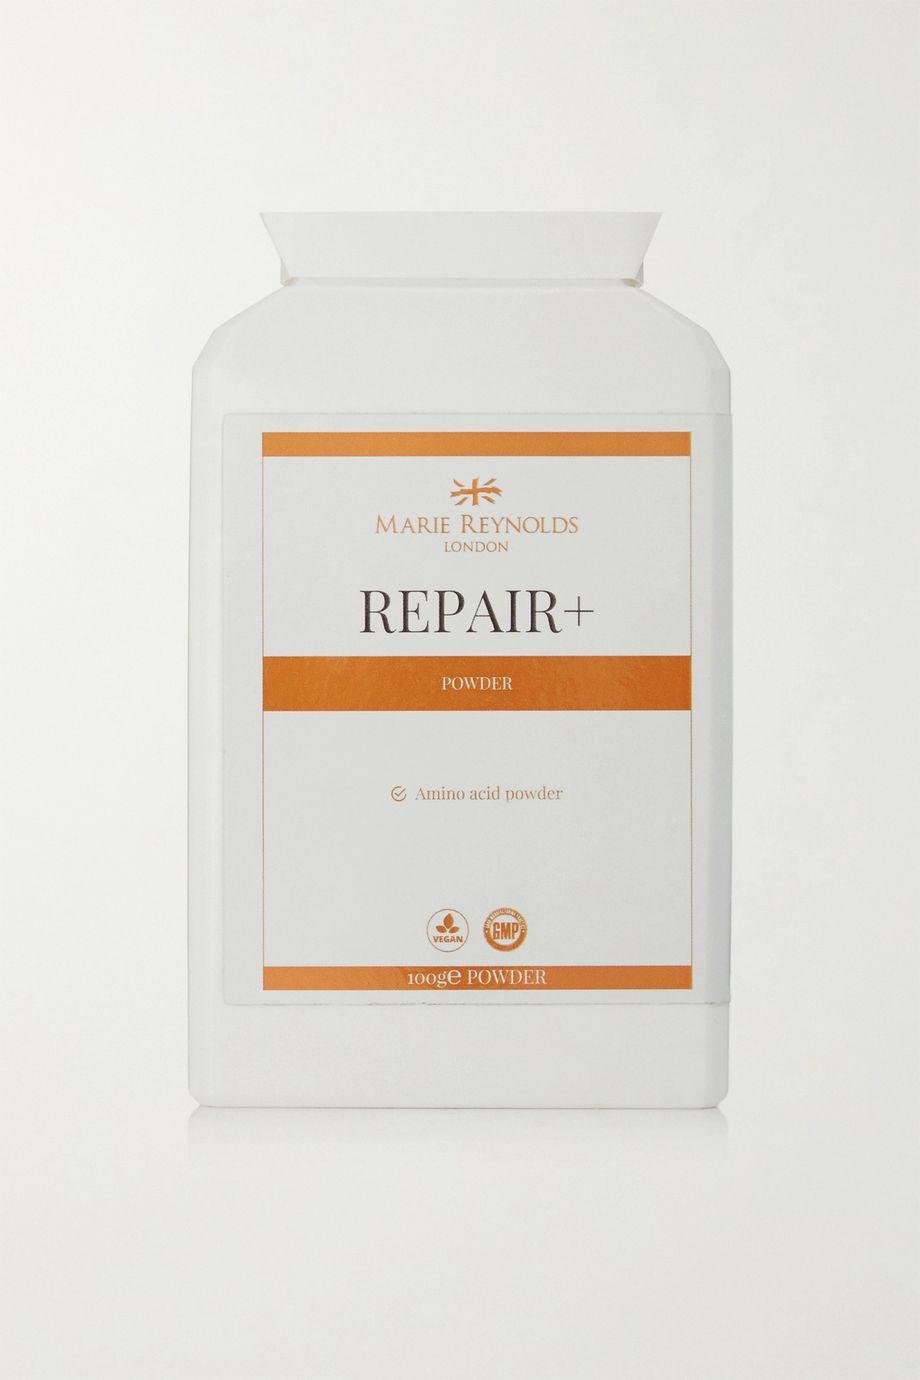 Marie Reynolds London Repair+ Powder, 100g